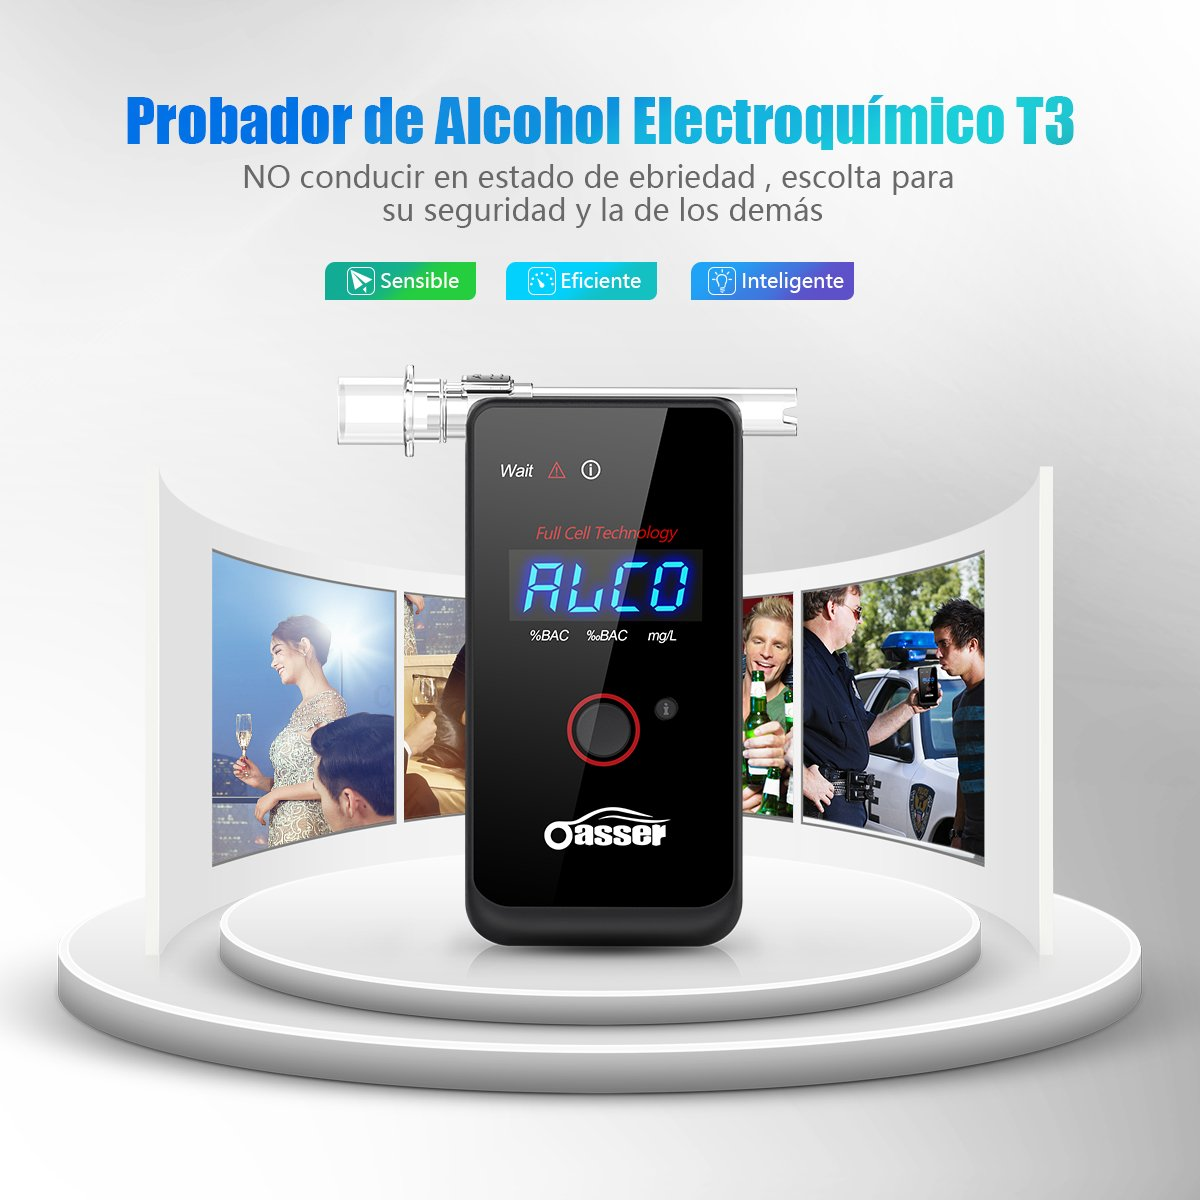 Coche y moto oasser Alcoholímetro Profesional Electroquímico Respiratorio de Recargable Digital Pantalla LED Incluye Batería de Litio & 4 Boquillas Desechables FDA T3